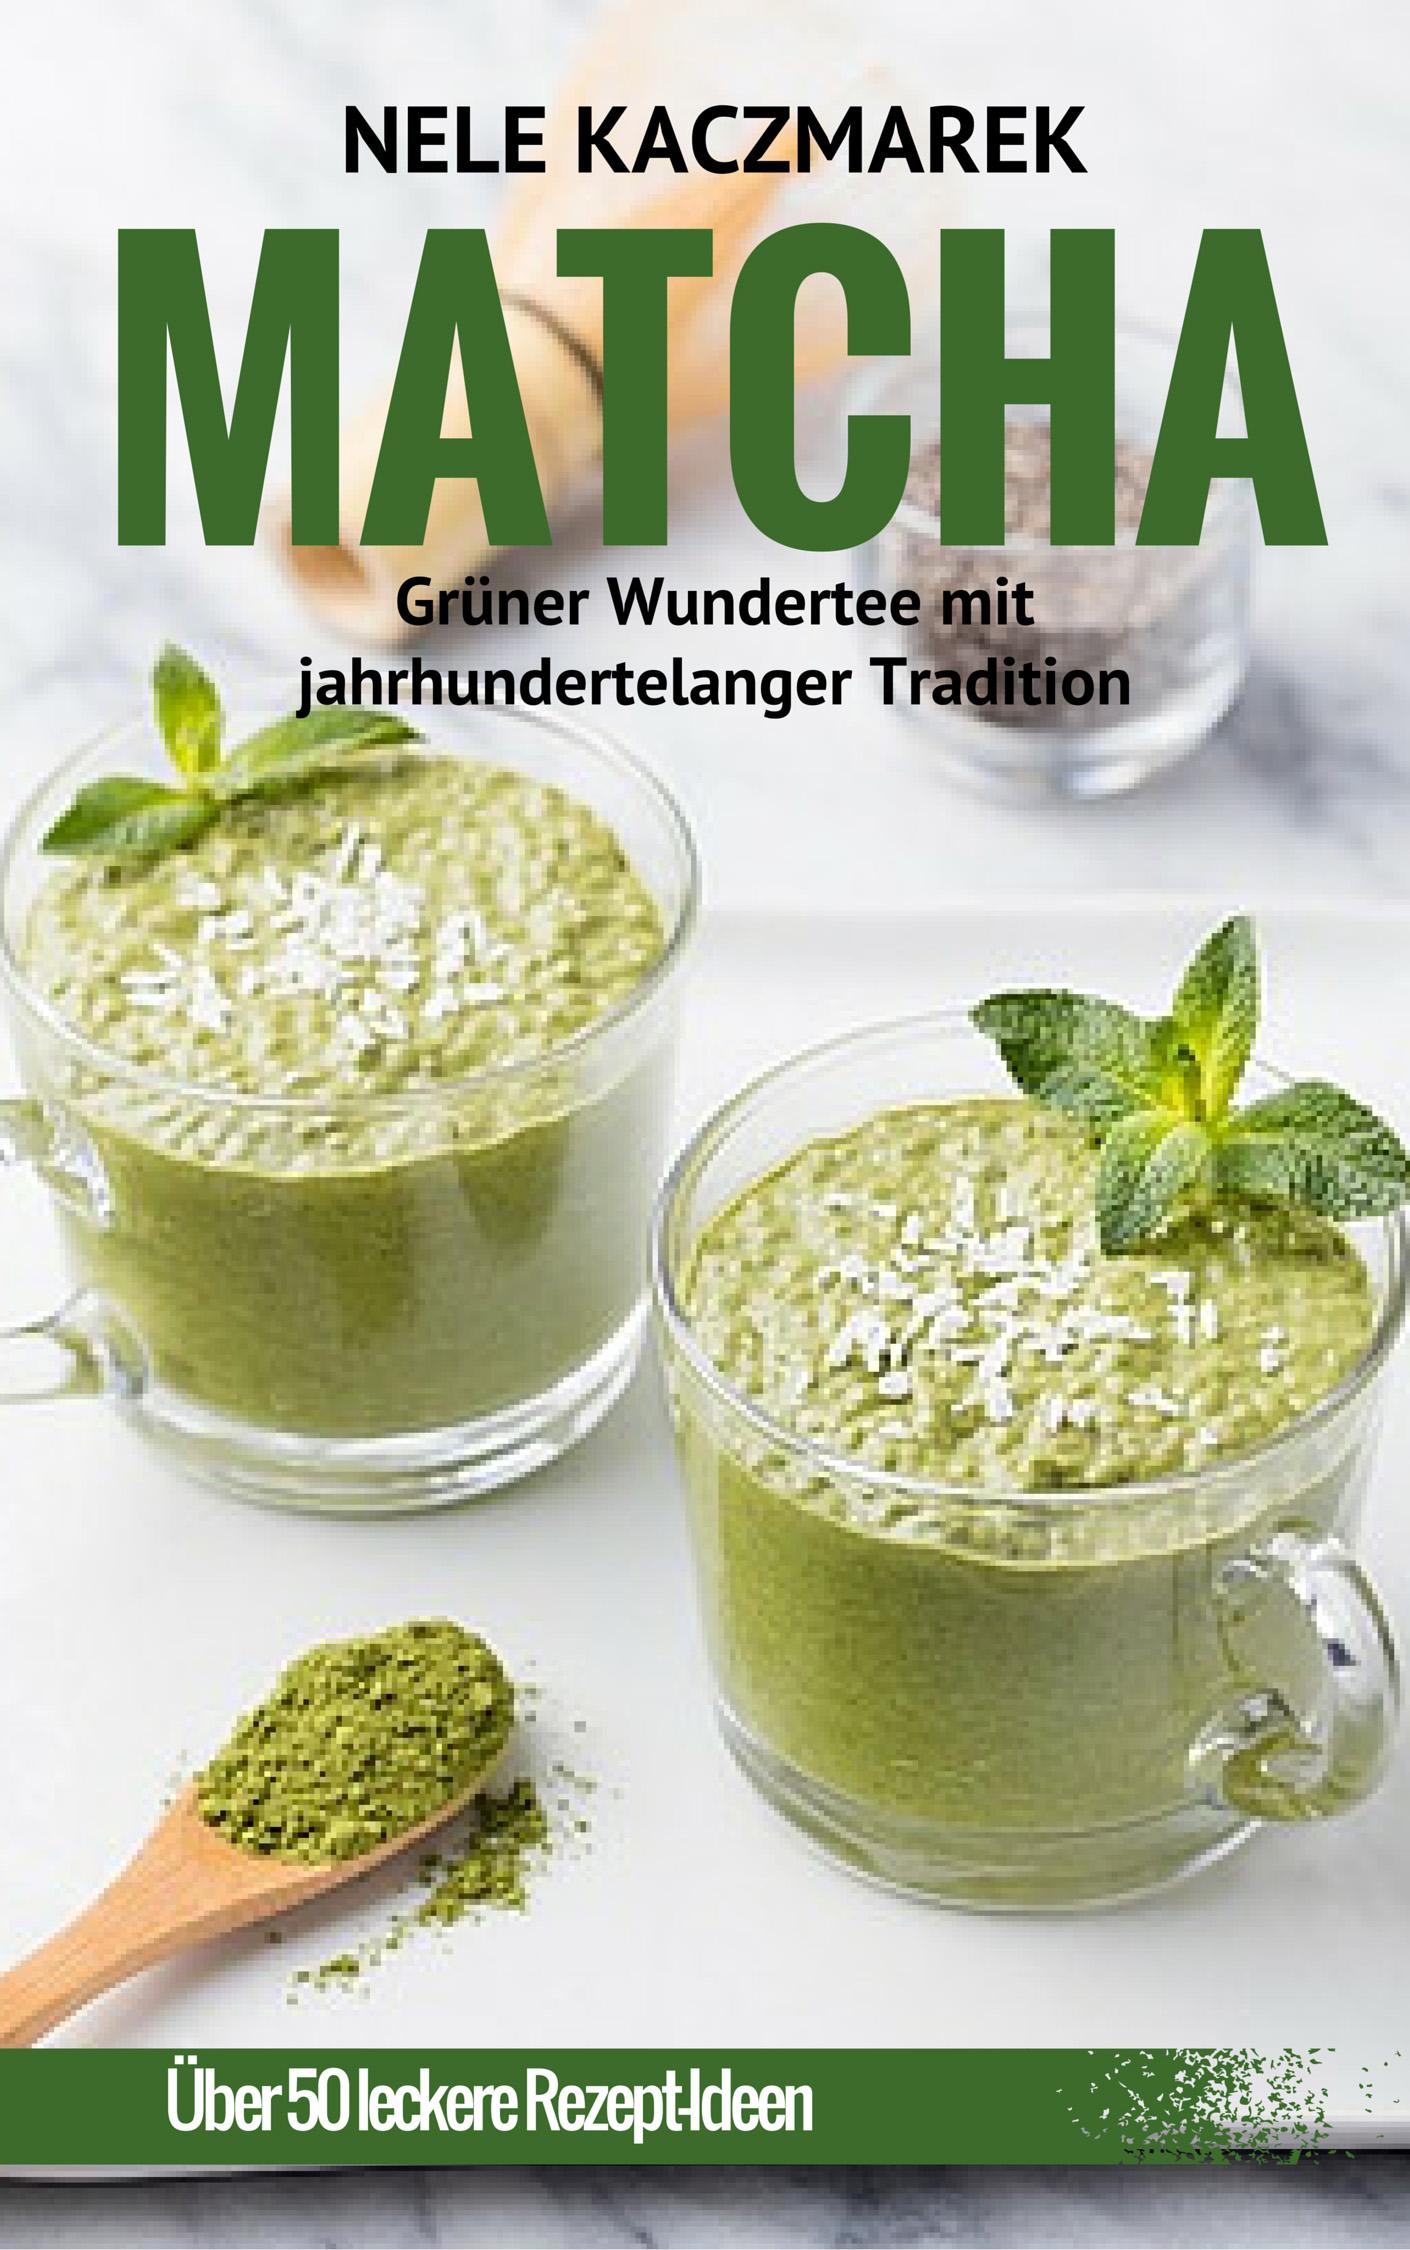 Nele Kaczmarek – Matcha – Grüner Wundertee mit jahrhundertelanger Tradition